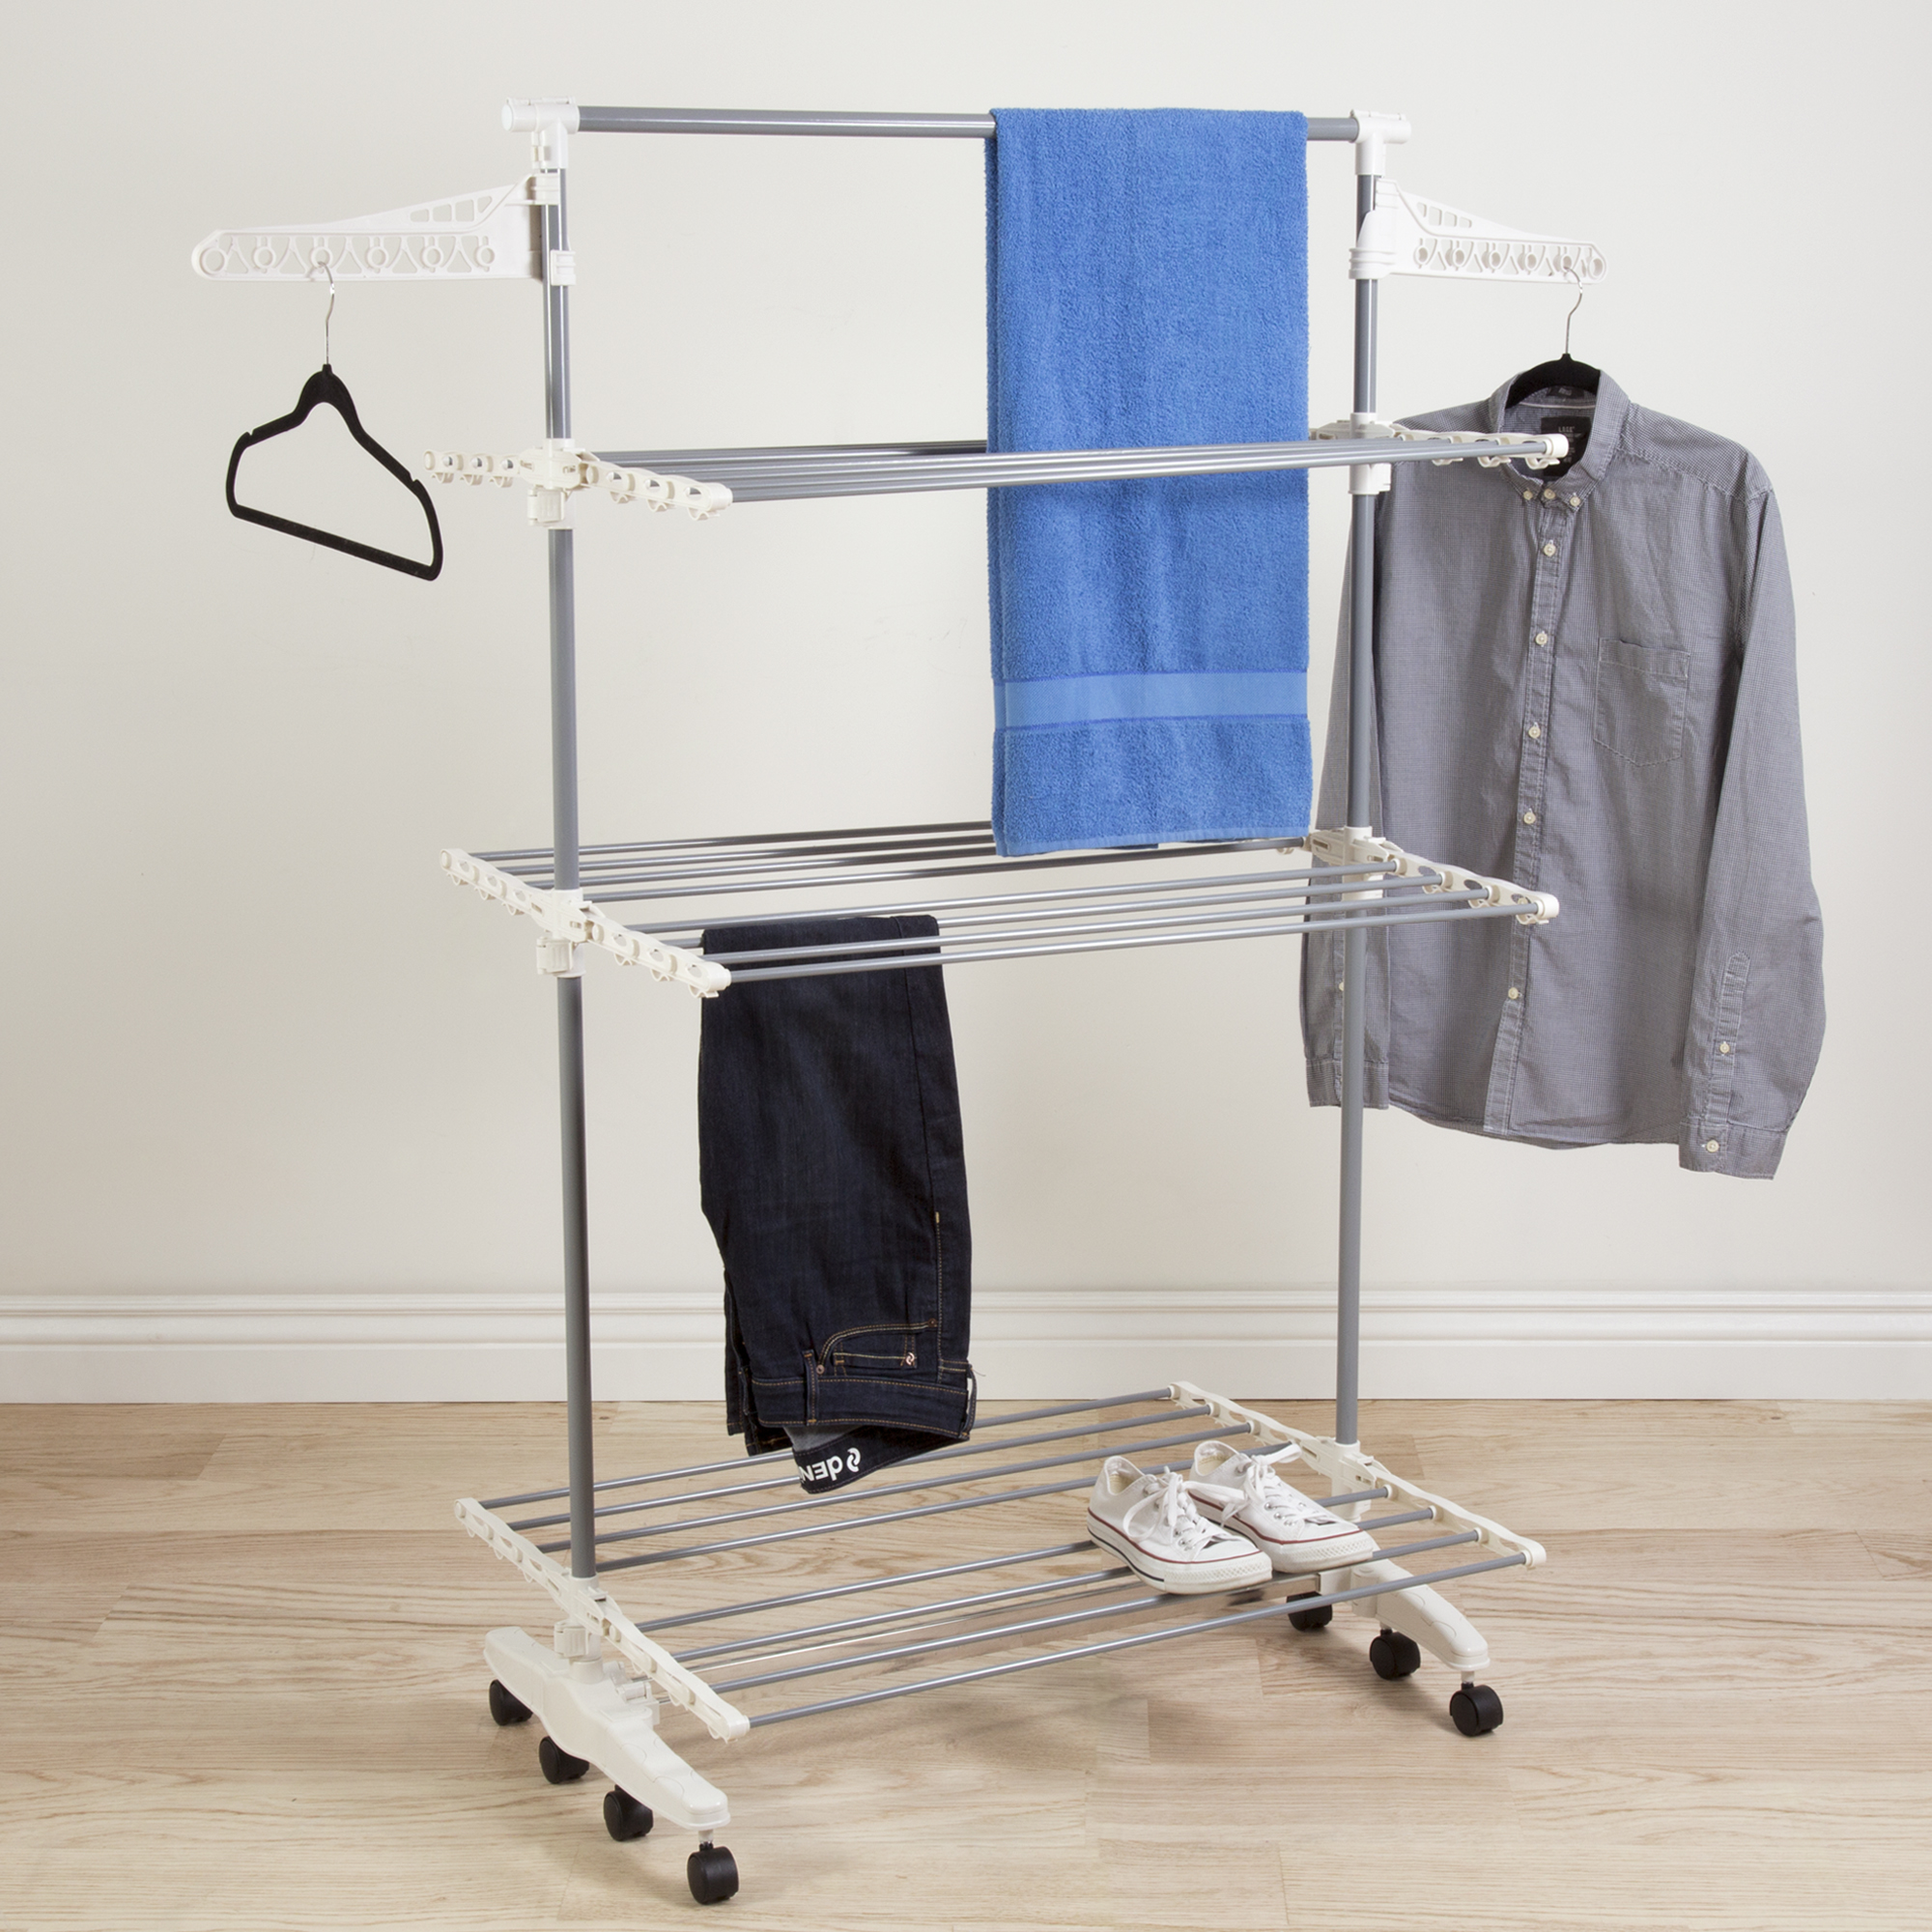 drying racks walmart com